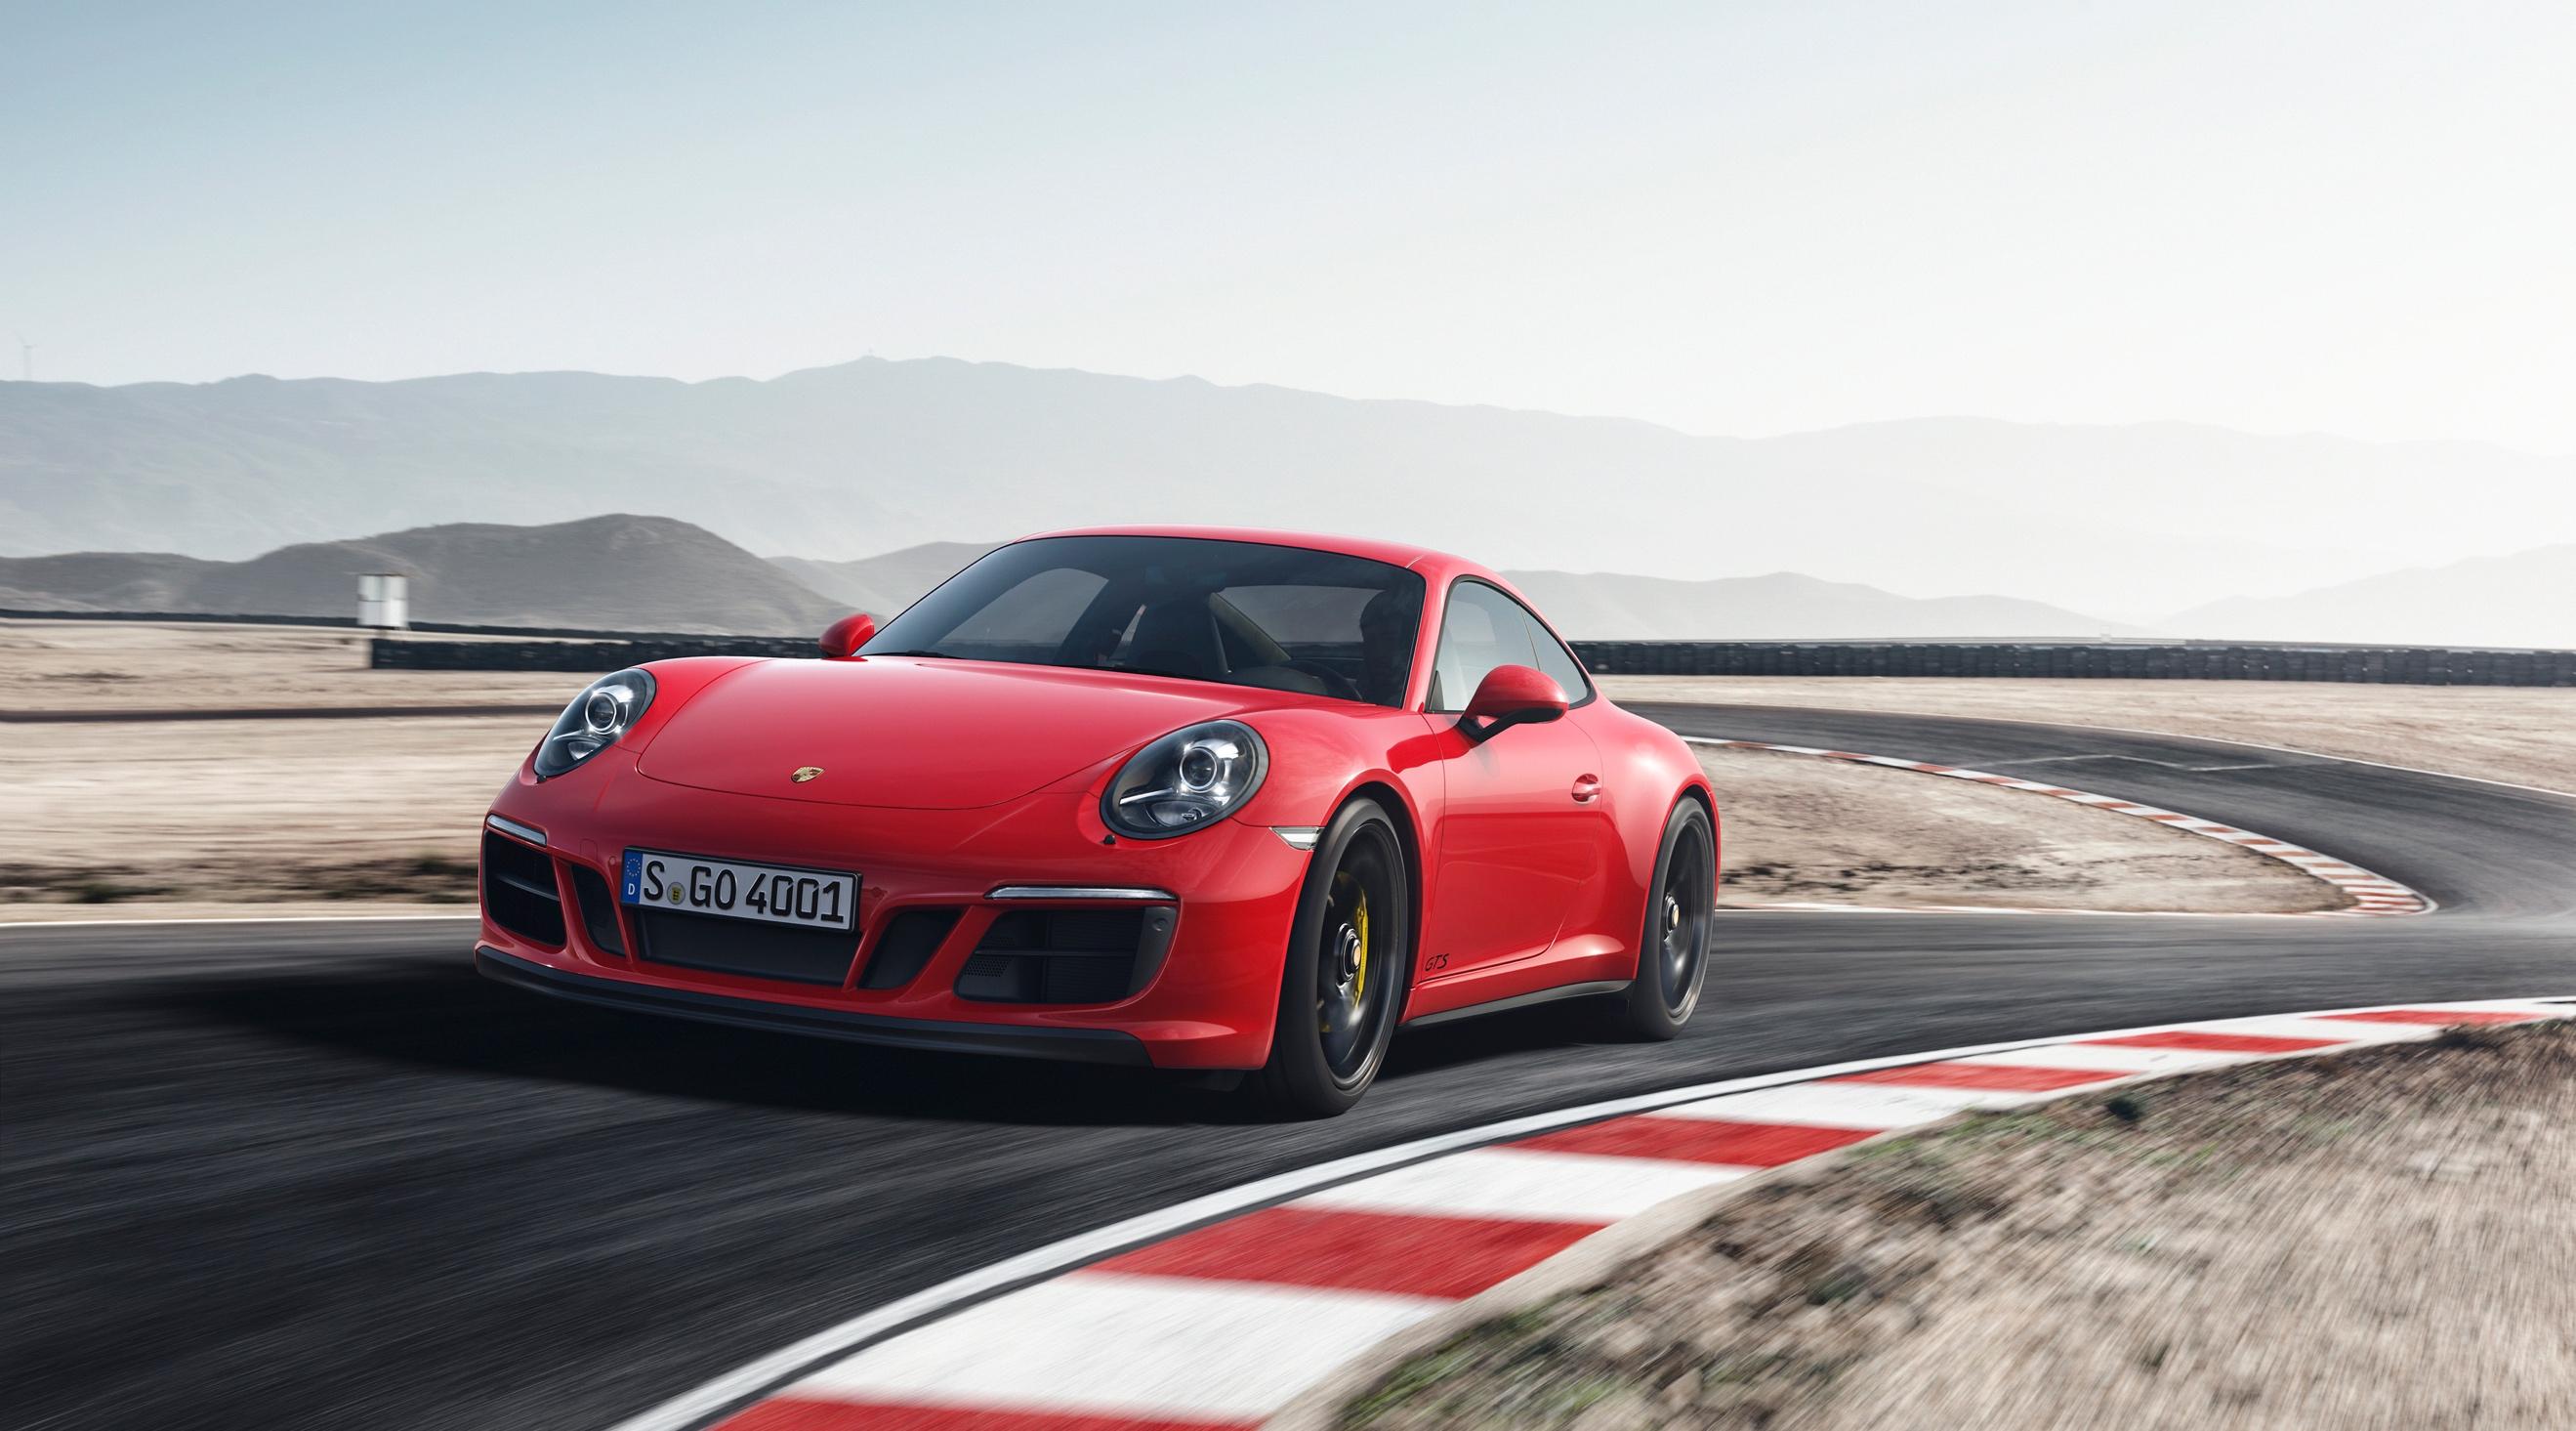 ../Porsche%20Press%20Kits/done/00003_911GTSLaunch/P16_1038_a4_rgb.jpg